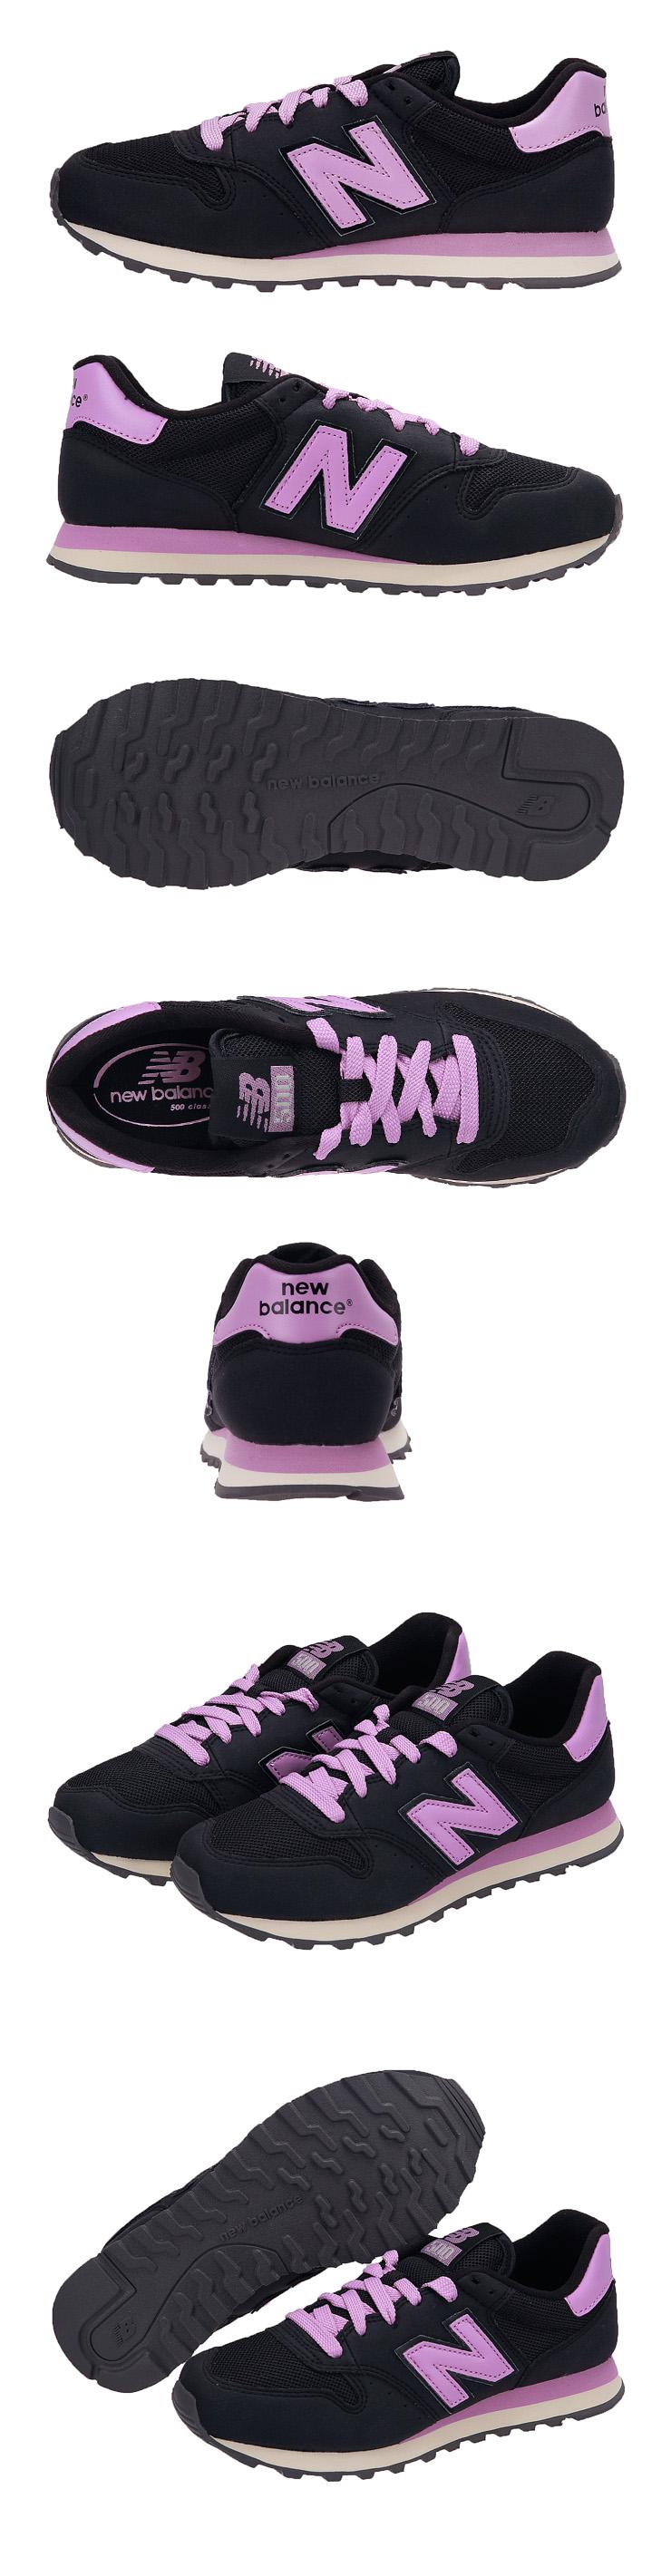 newbalance新百伦公司2014新品nb女鞋复古鞋跑步鞋gw